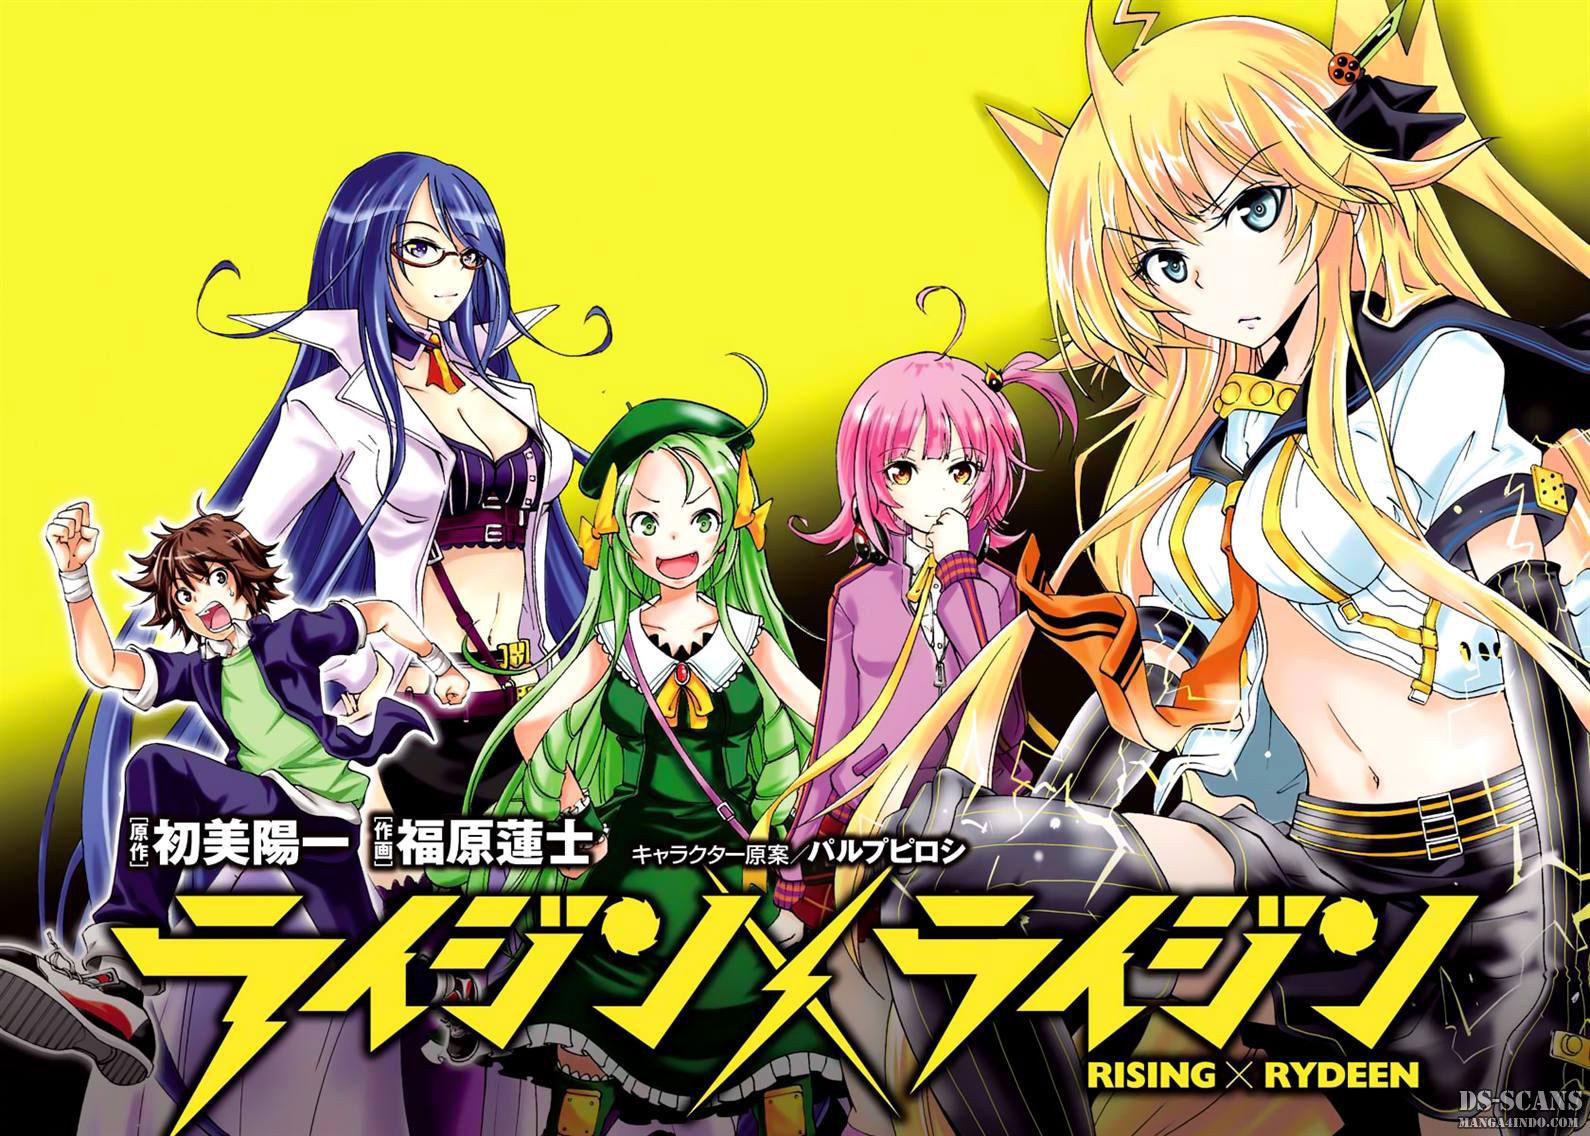 Komik manga RXR M4I CH1 02 rising x rydeen